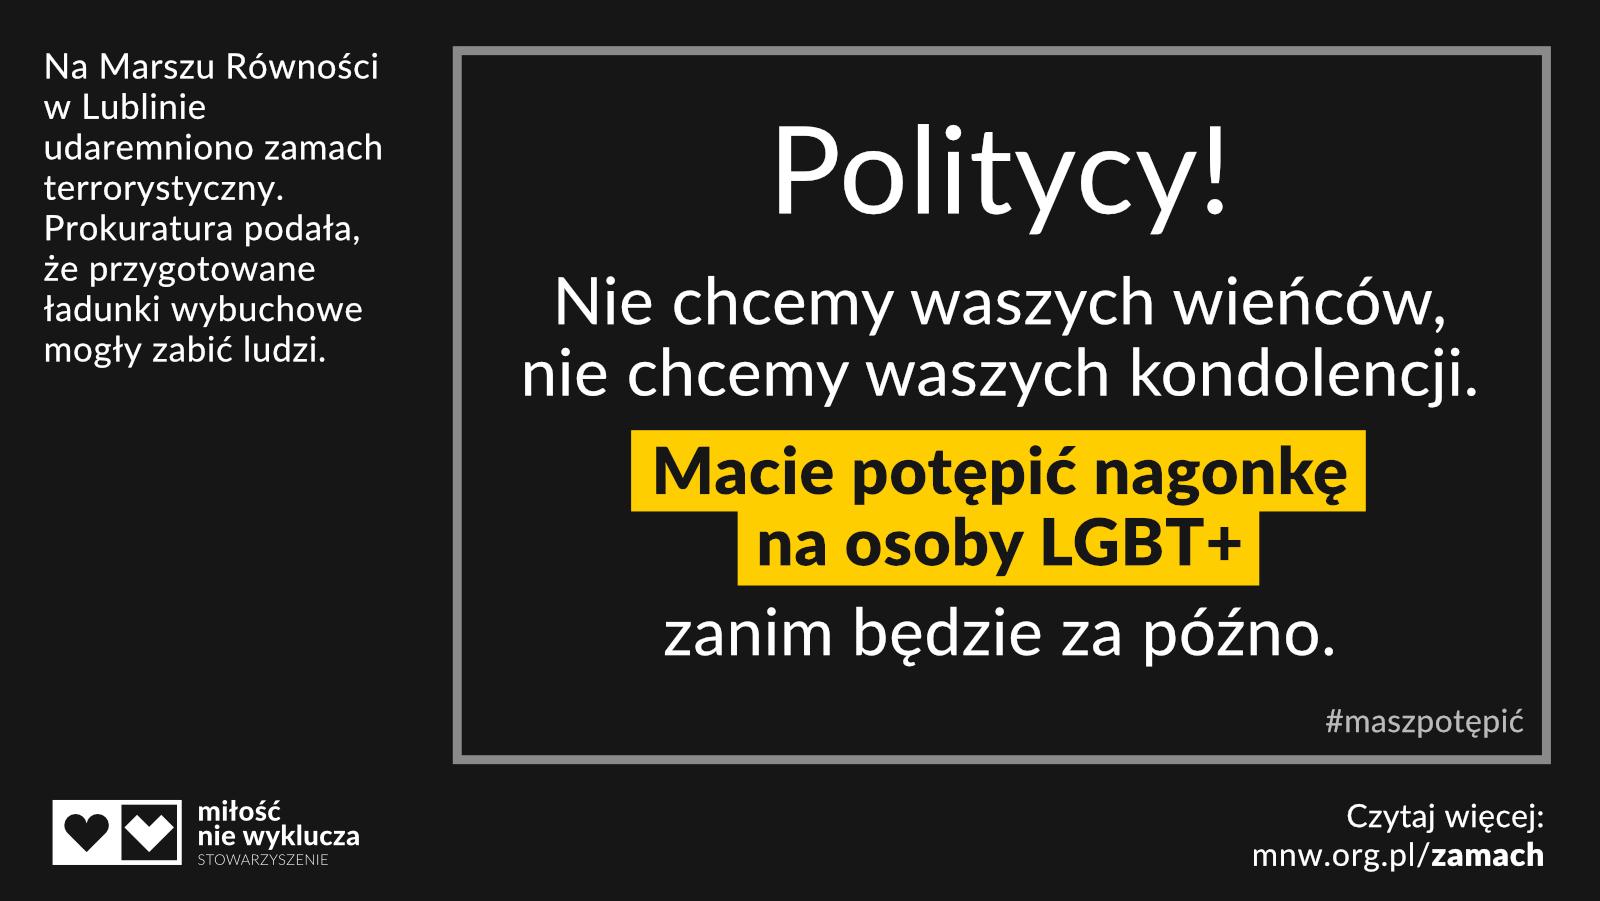 politycy #maszpotepic zamach LGBT+ cover tt